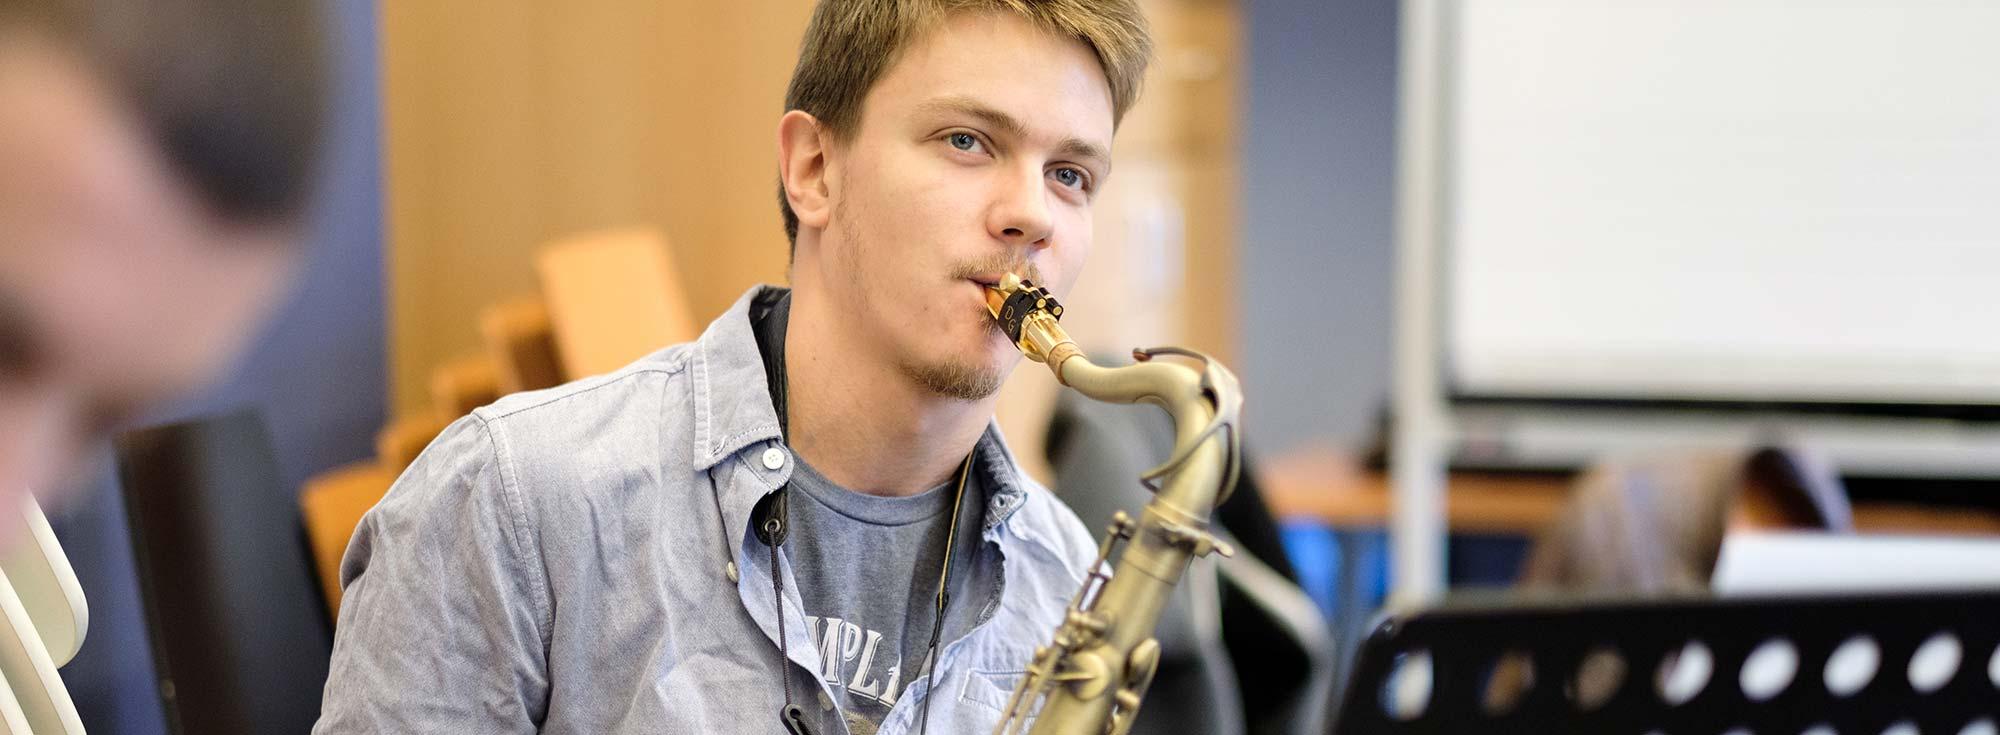 Instrumentalmusikerziehung (IME)